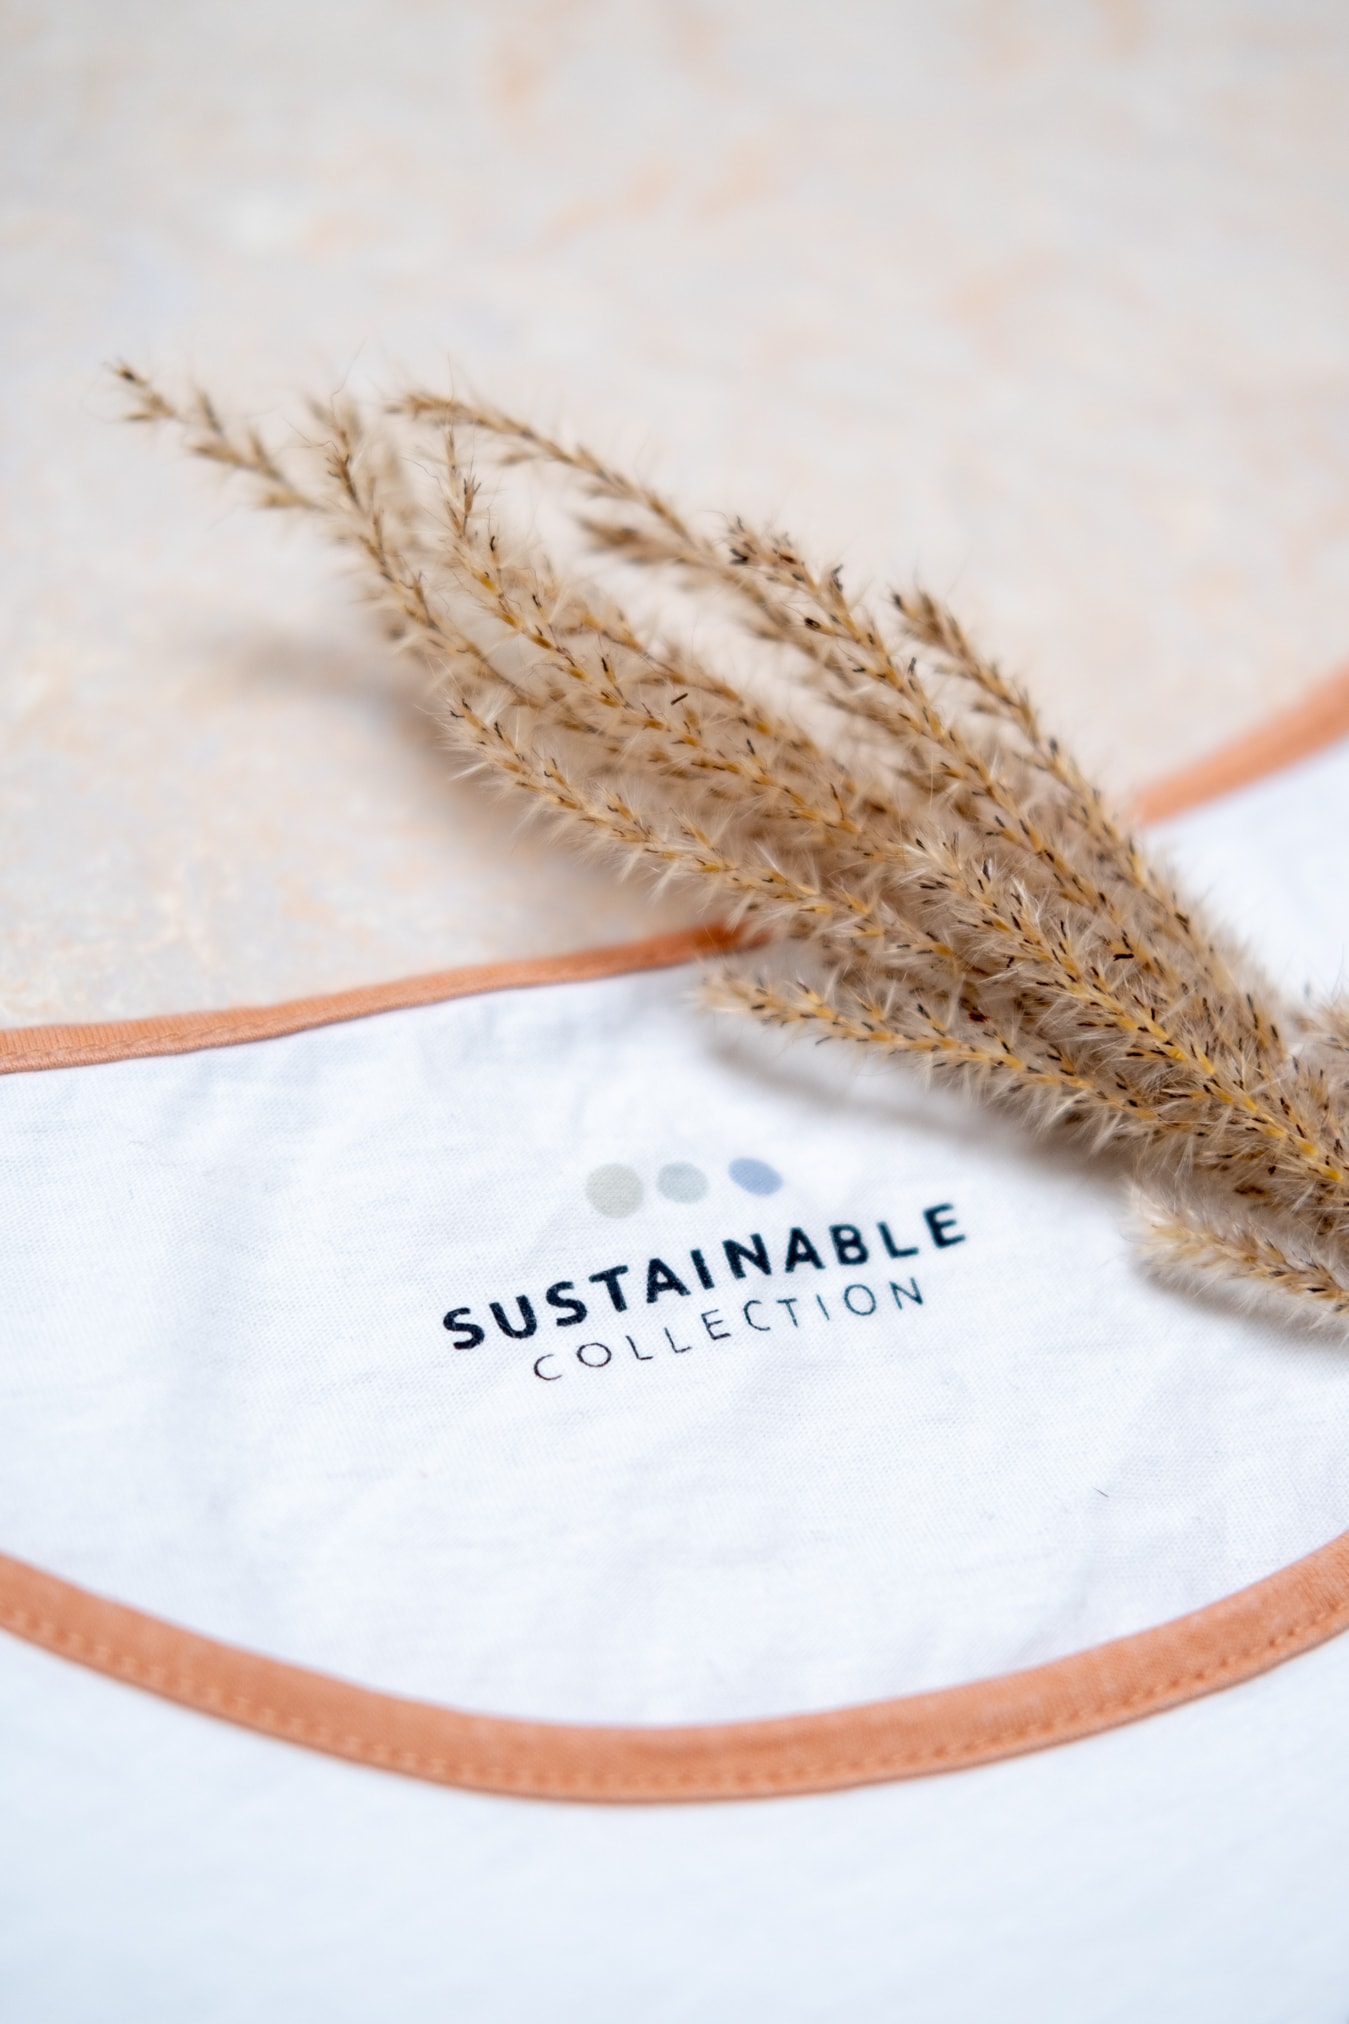 bonprix sustainable collection